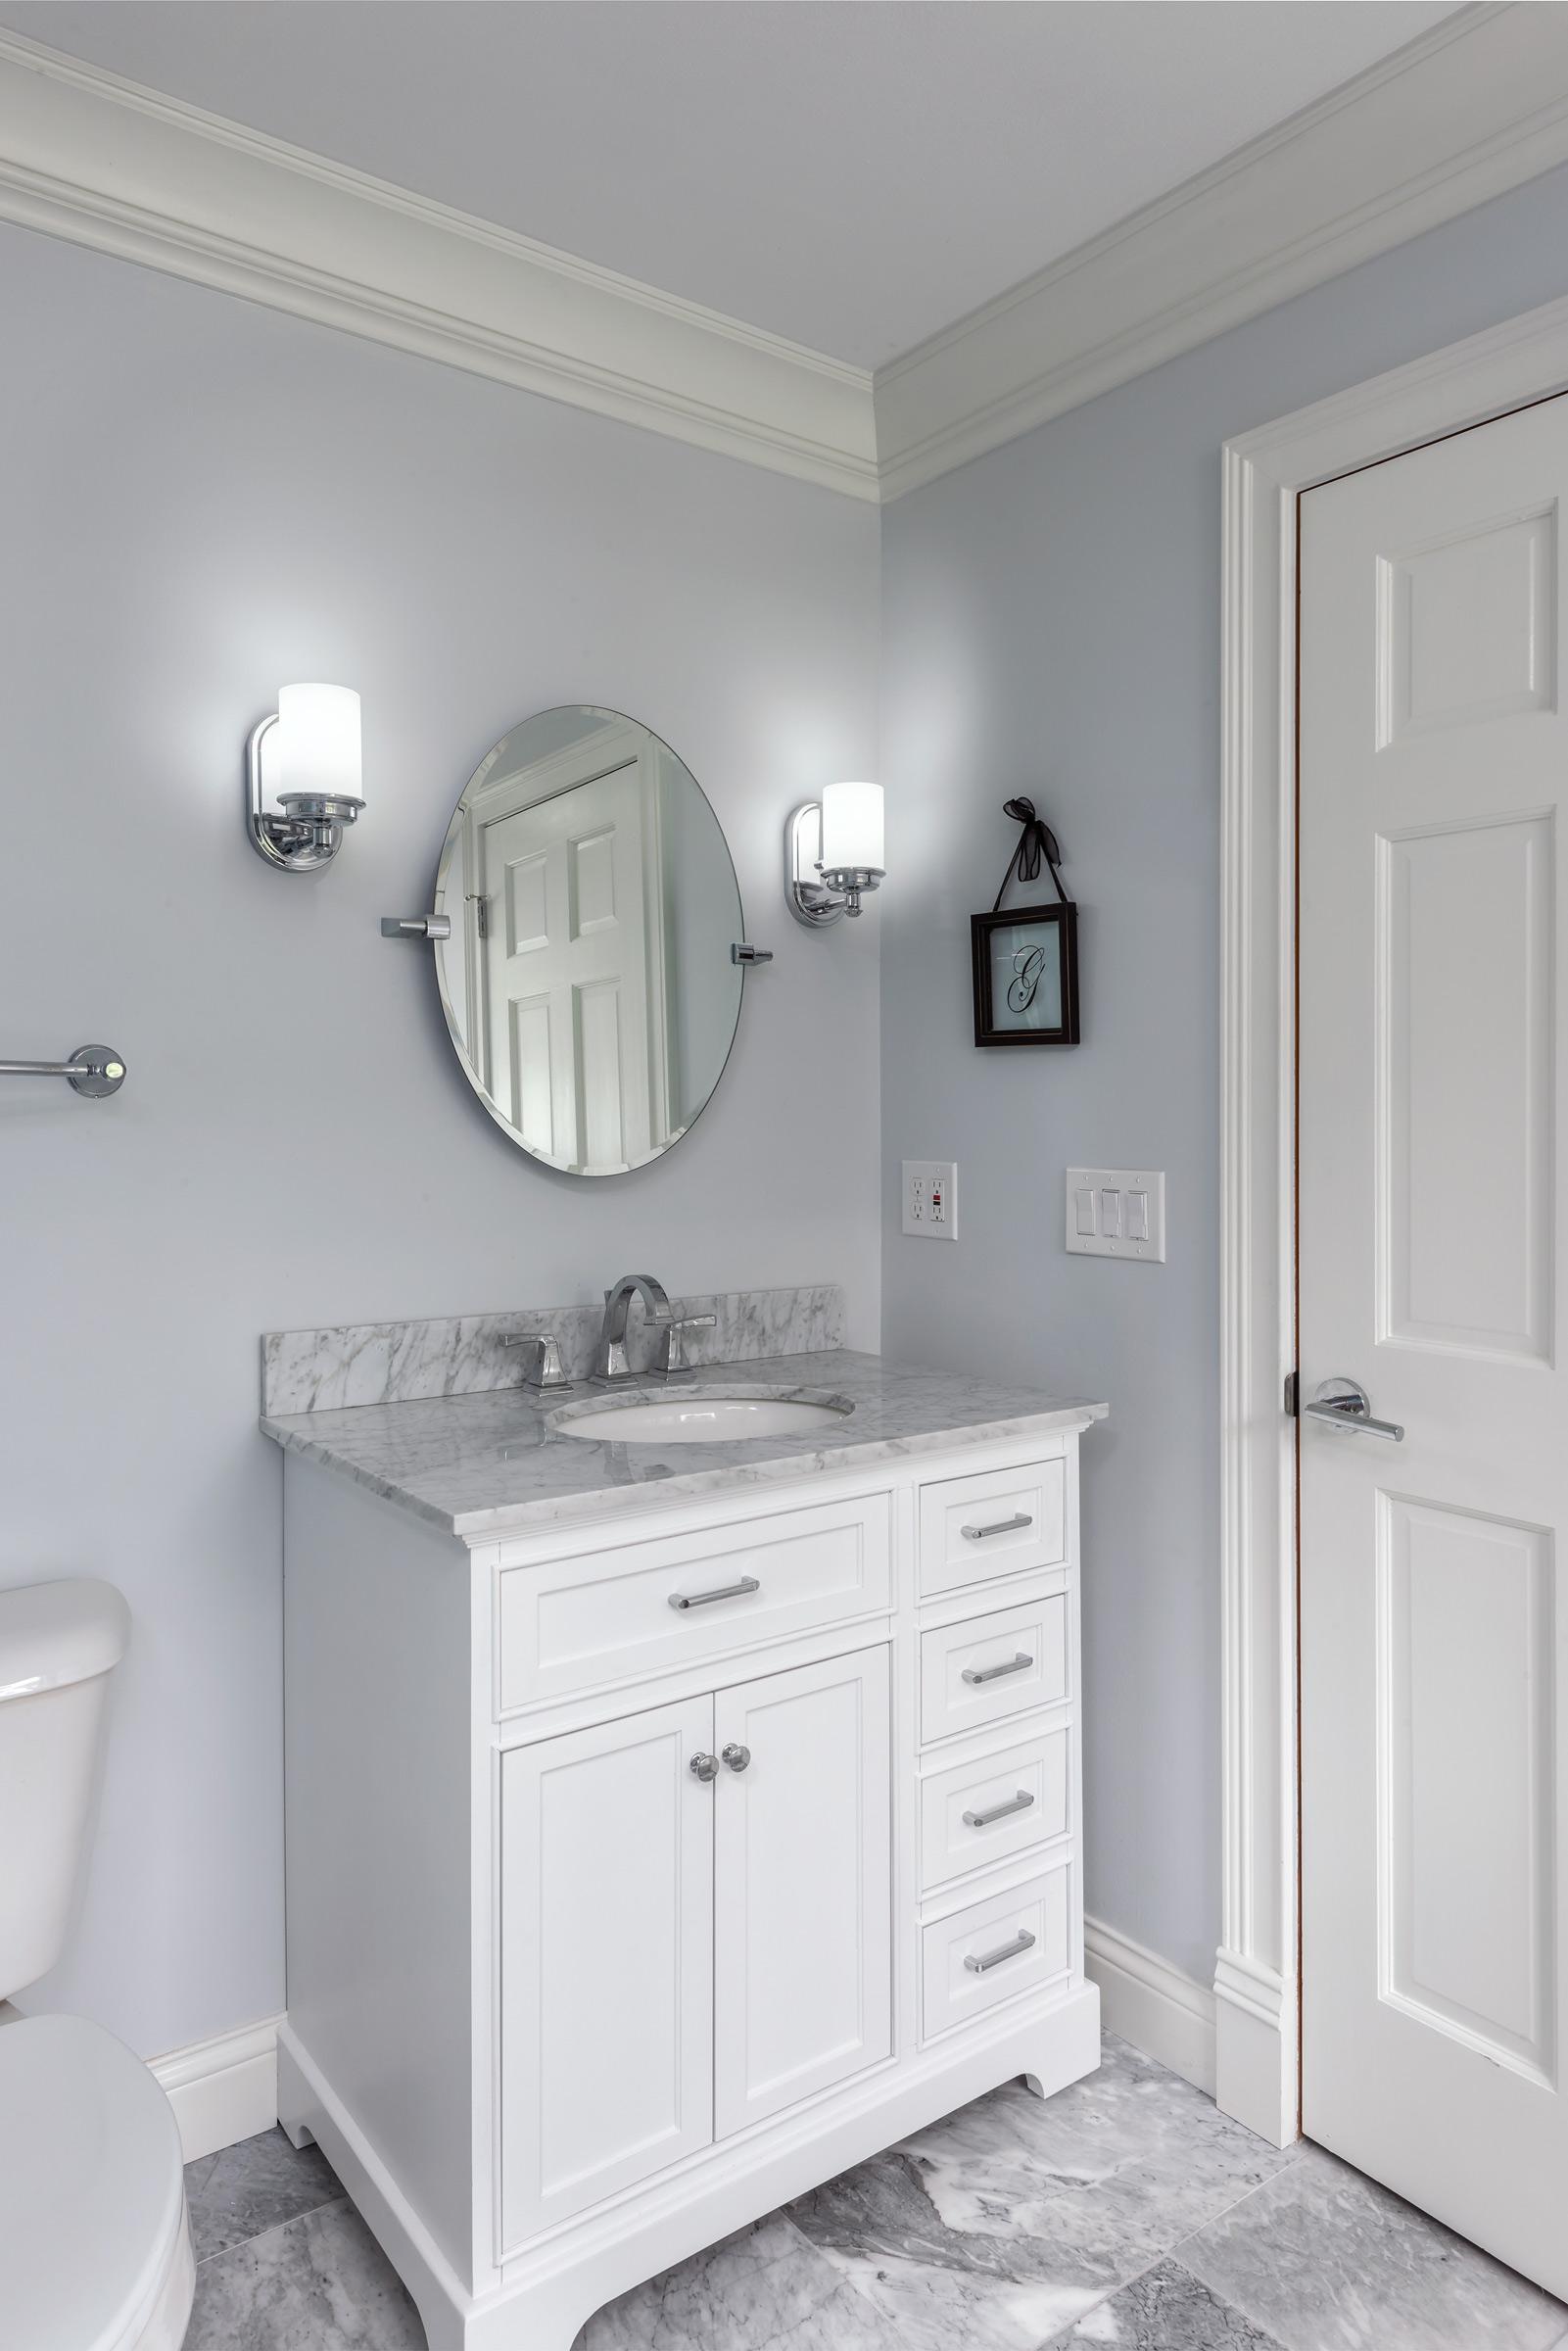 Grey Marble and White Vanity Bathroom Re